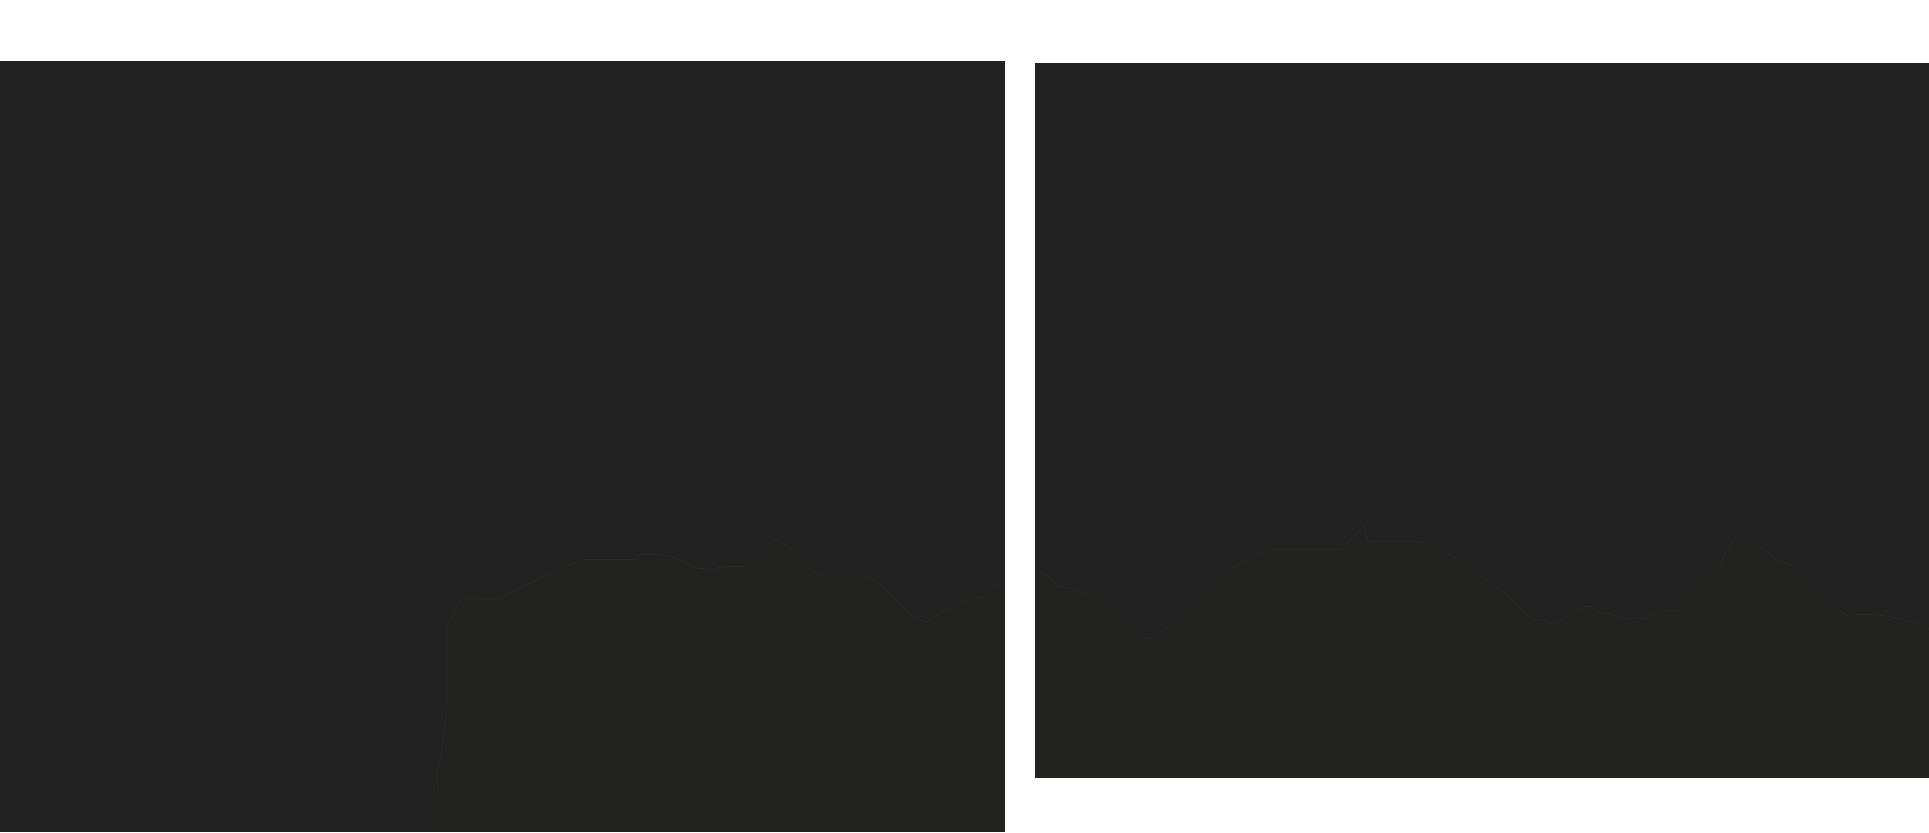 Ejm Art|Fabric/Product Print Designs